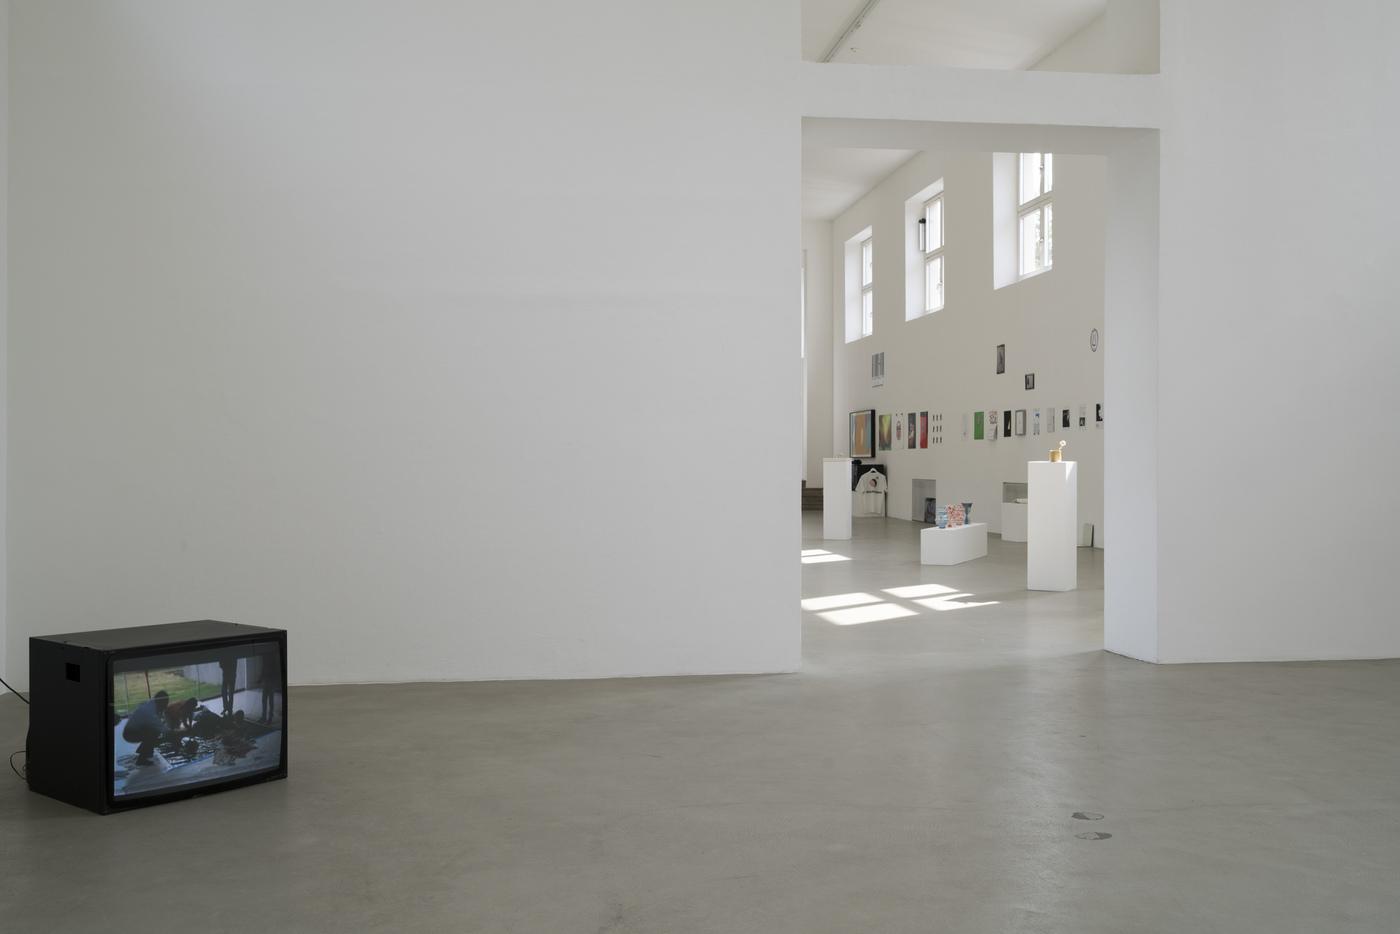 Darius Mikšys, Hayward & Tamayo, Exhibition View in Kunstverein München 2016 © Kunstverein München e.V.1